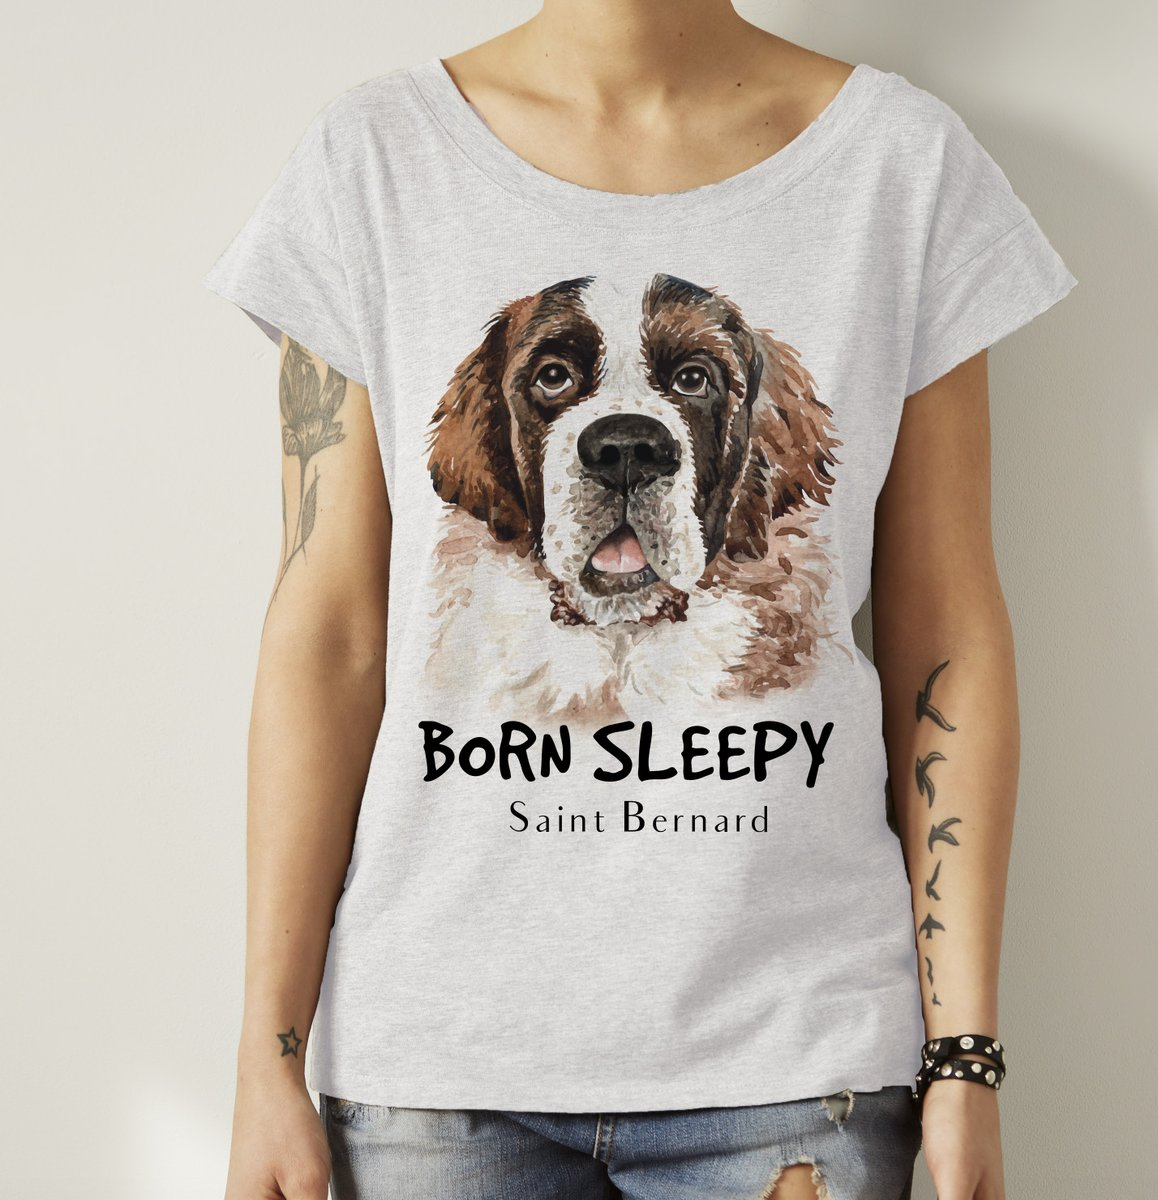 #Puglife Short Sleeve t-Shirt Hash Tag Dog Lover